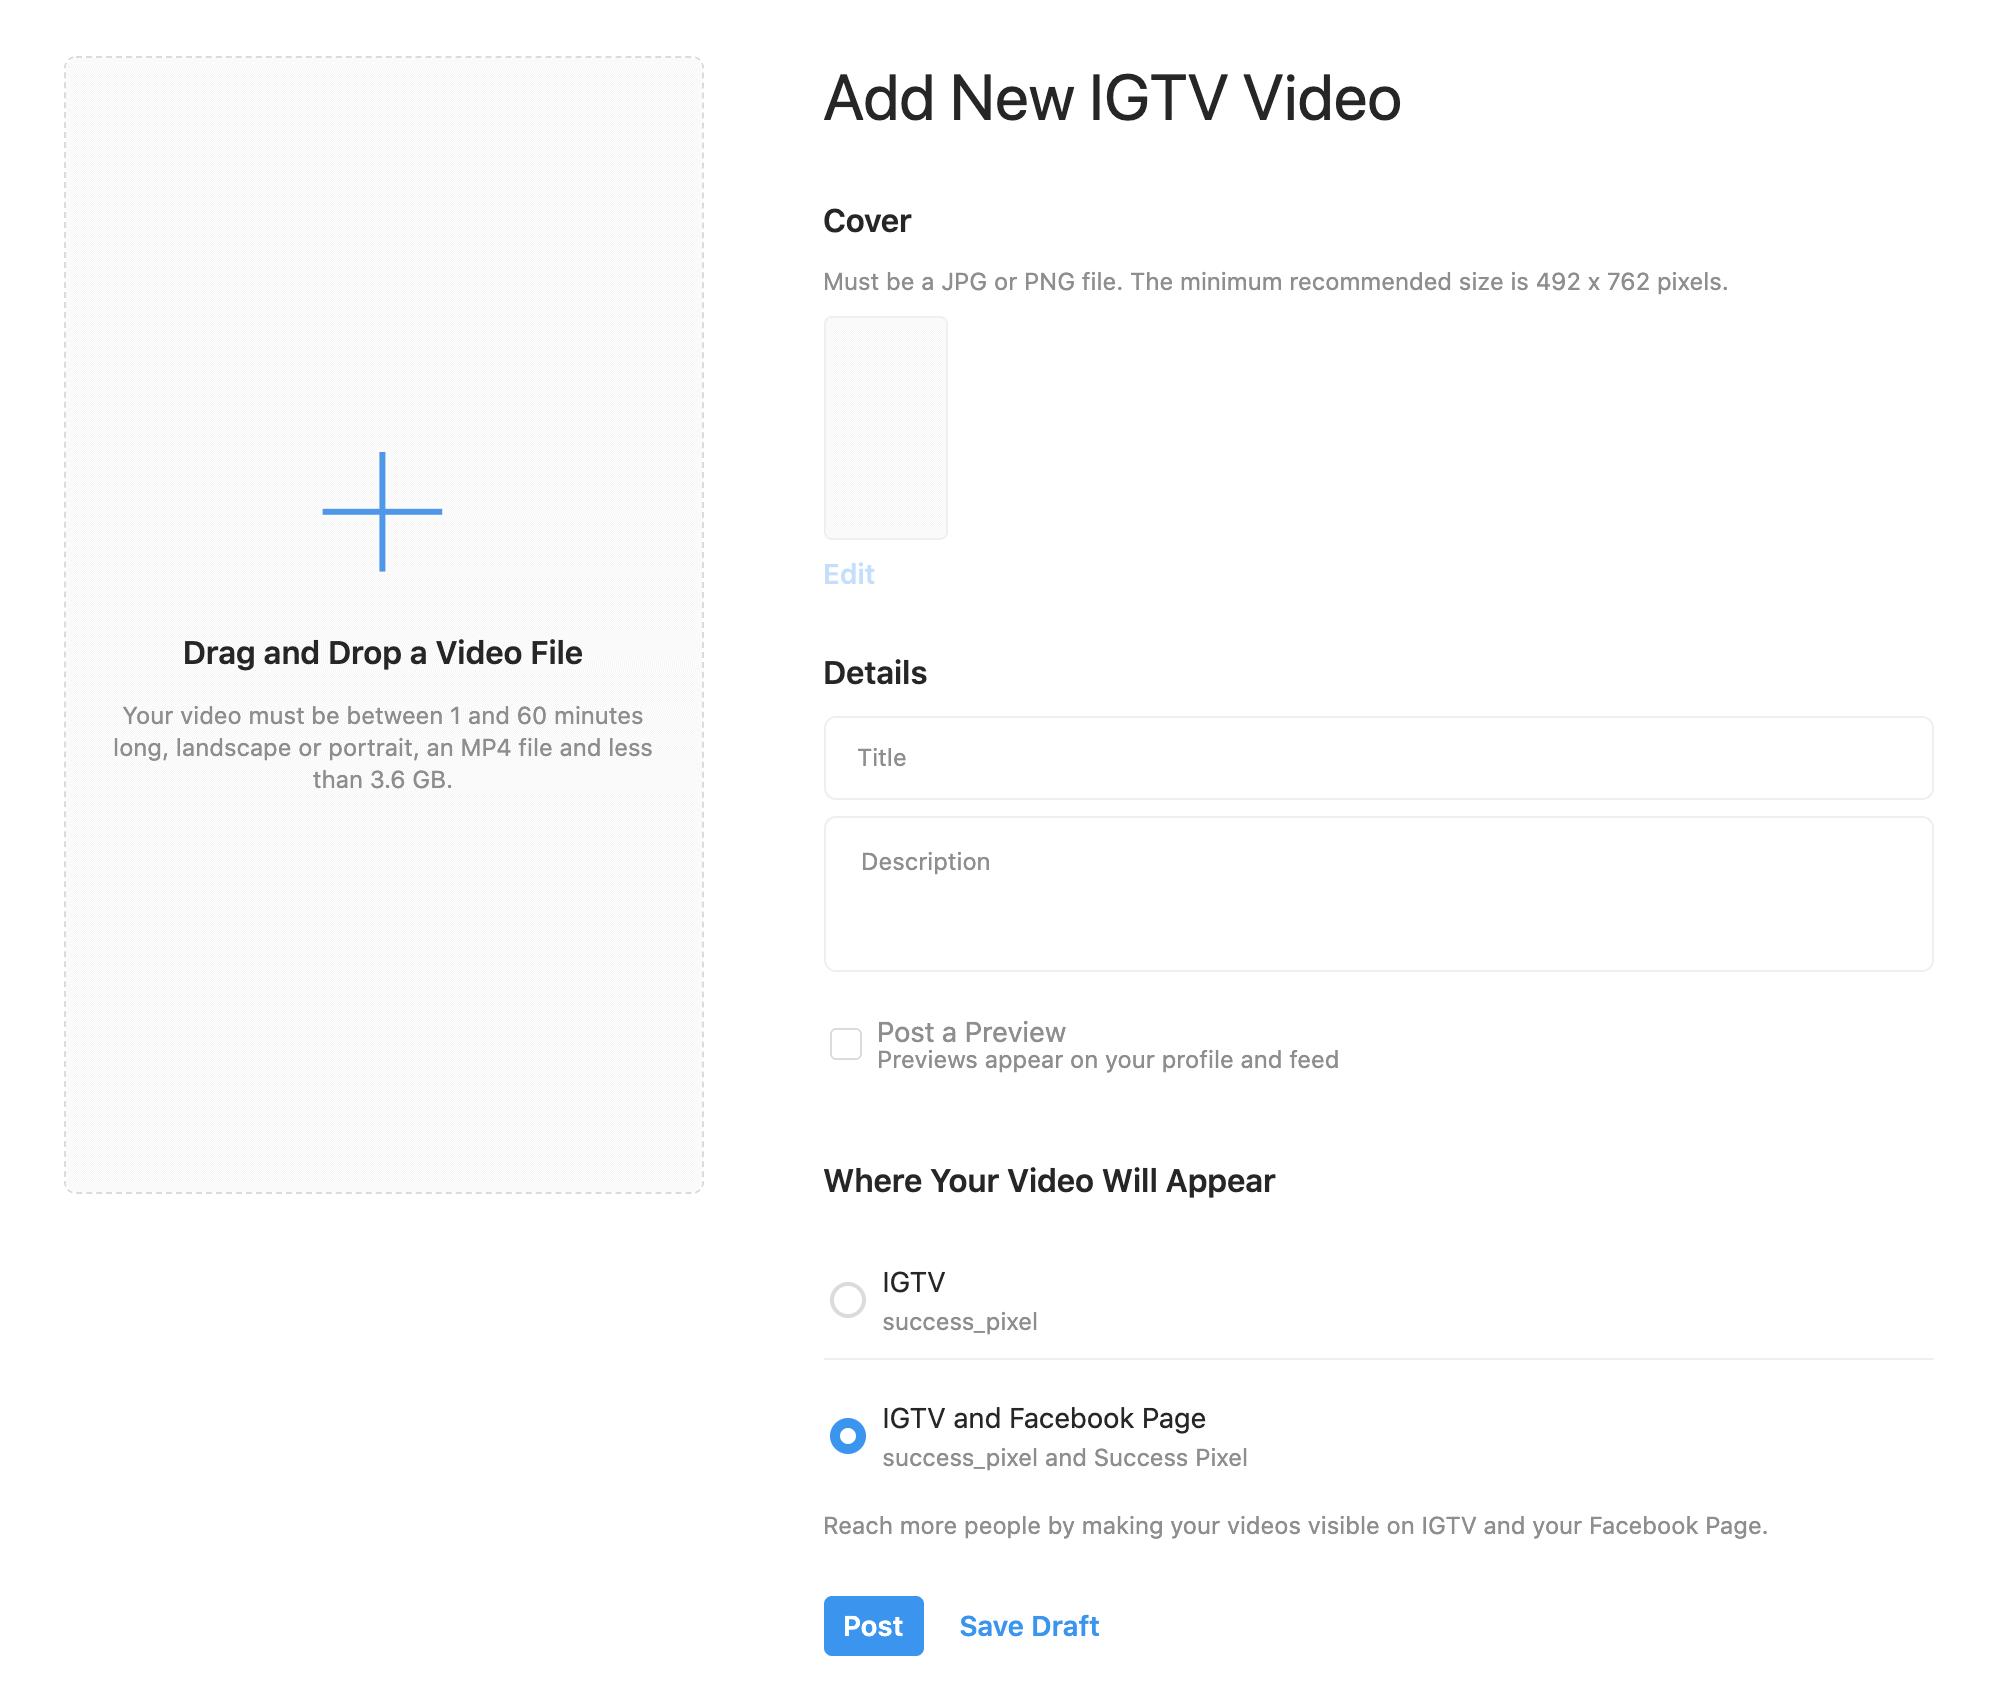 IGTV Video Upload Window Desktop Mode